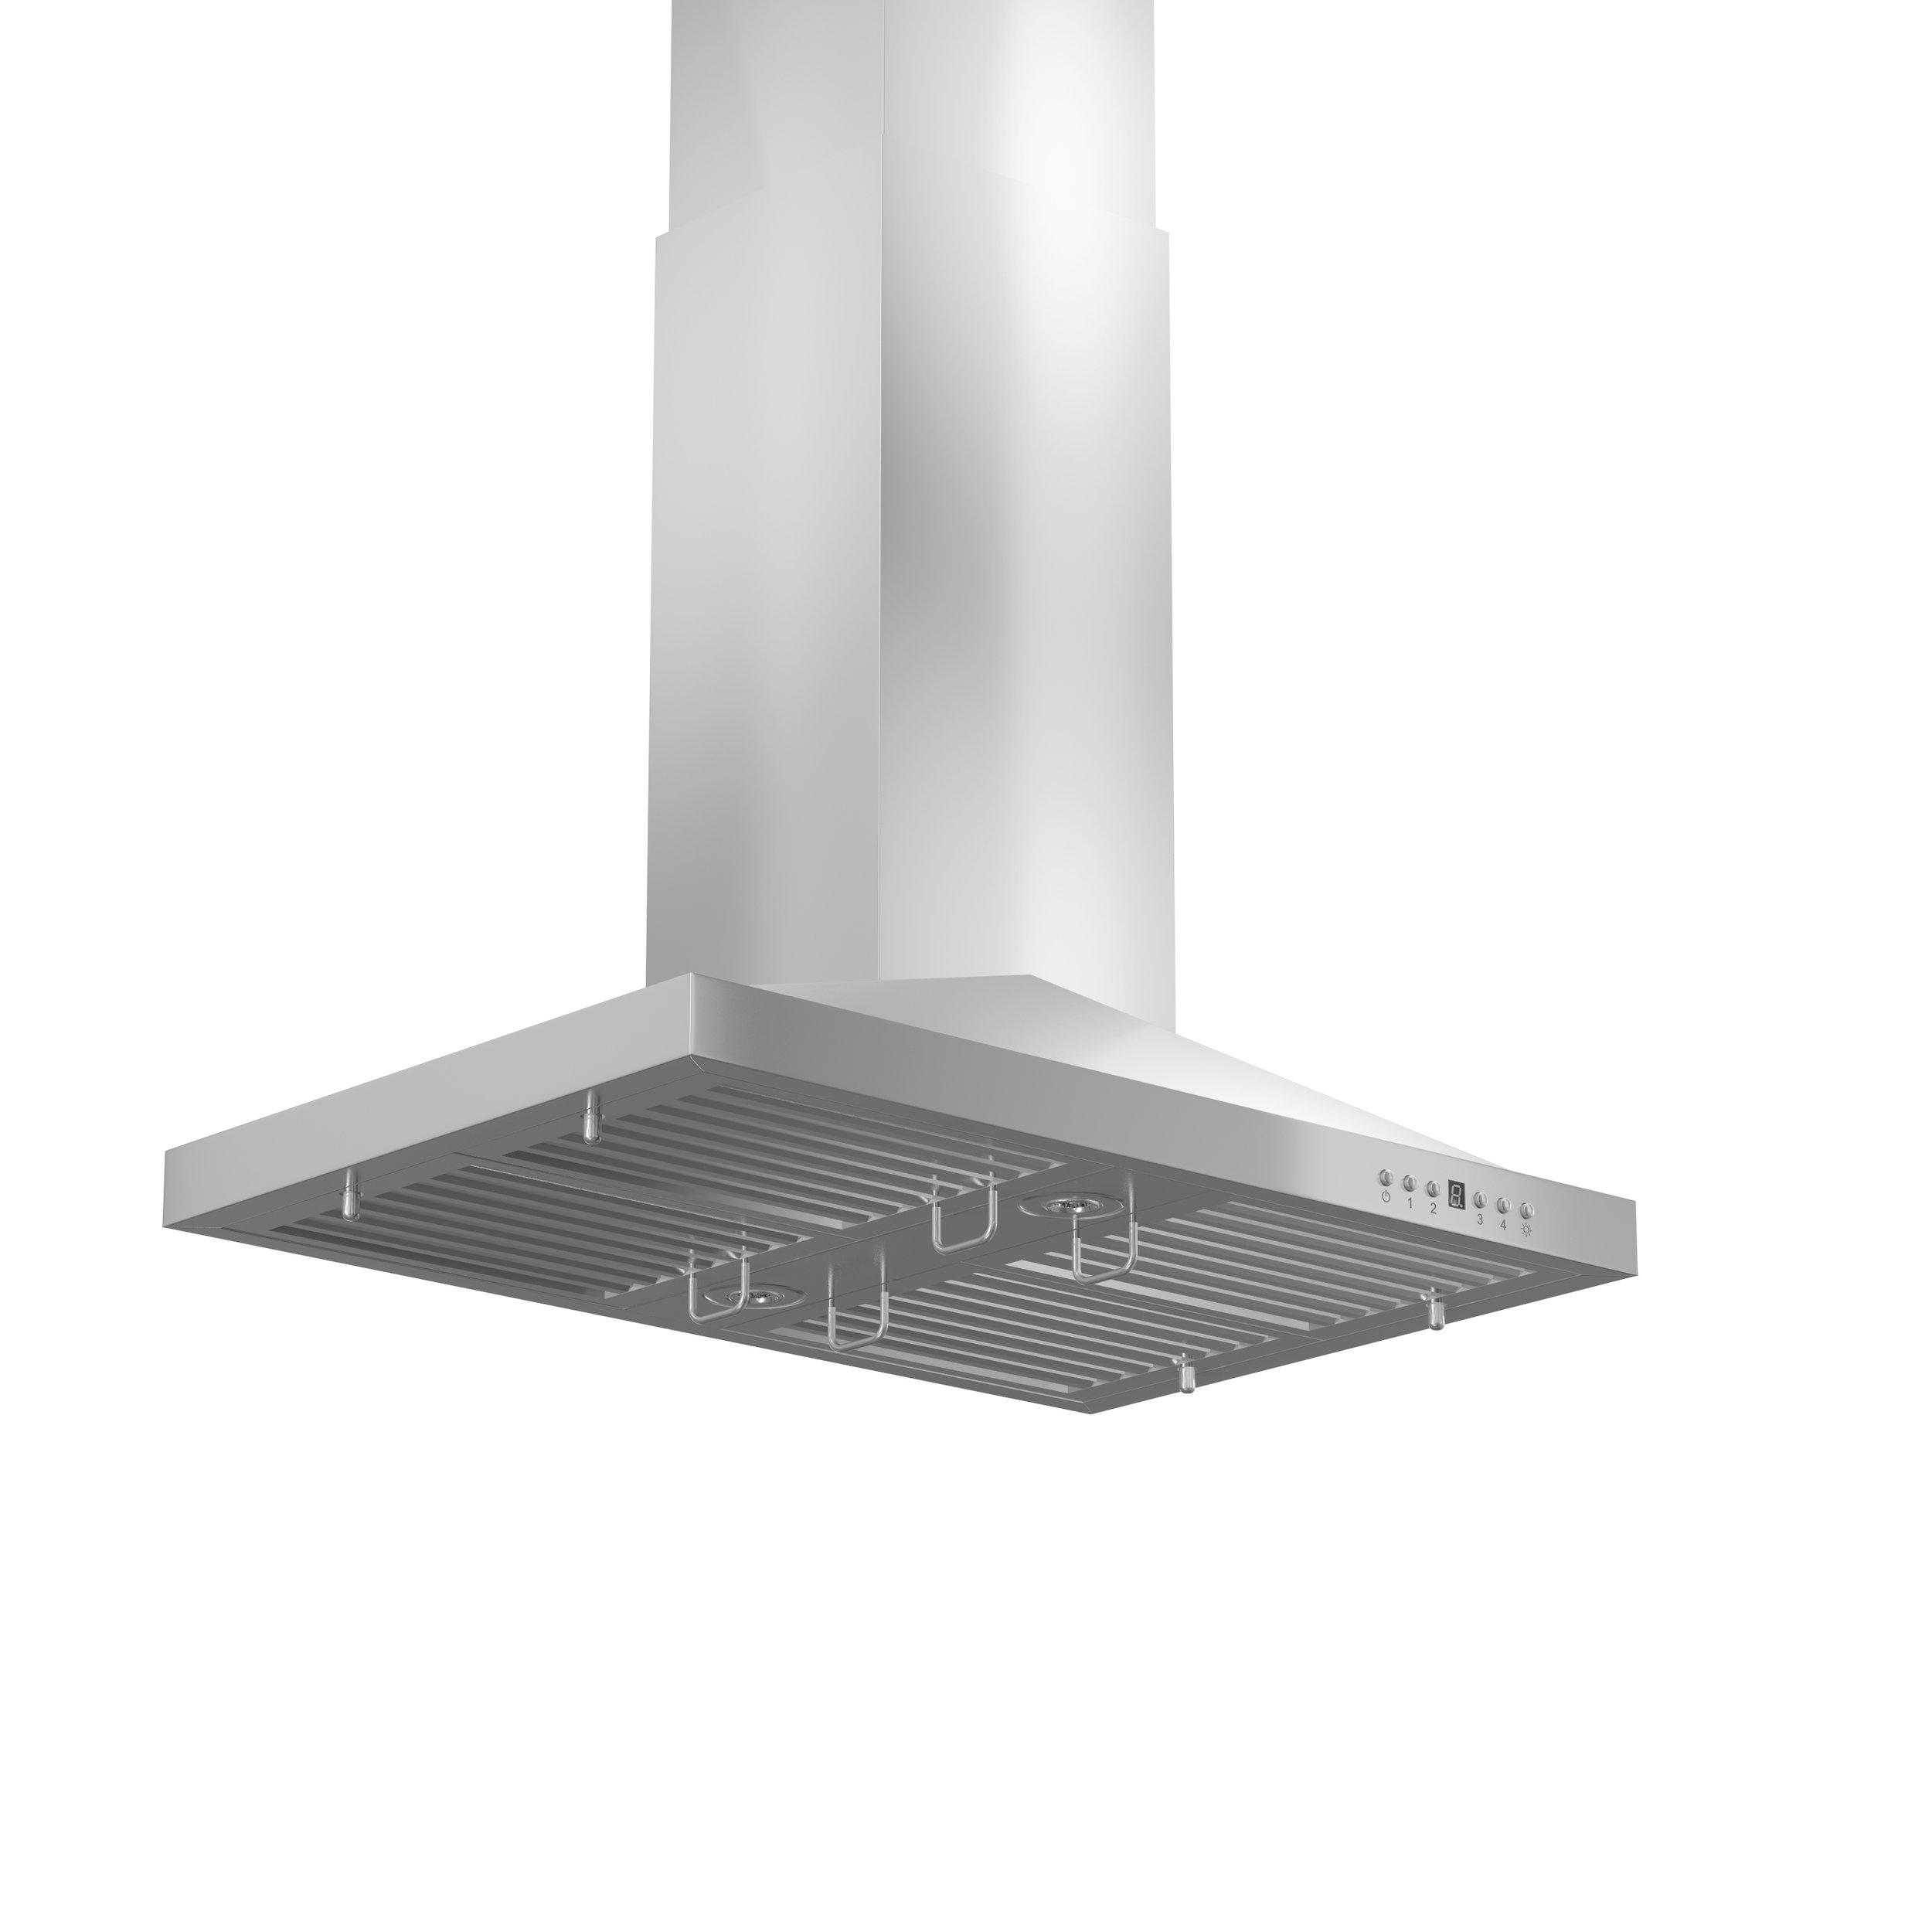 zline-stainless-steel-island-range-hood-GL1i-side-under.jpg